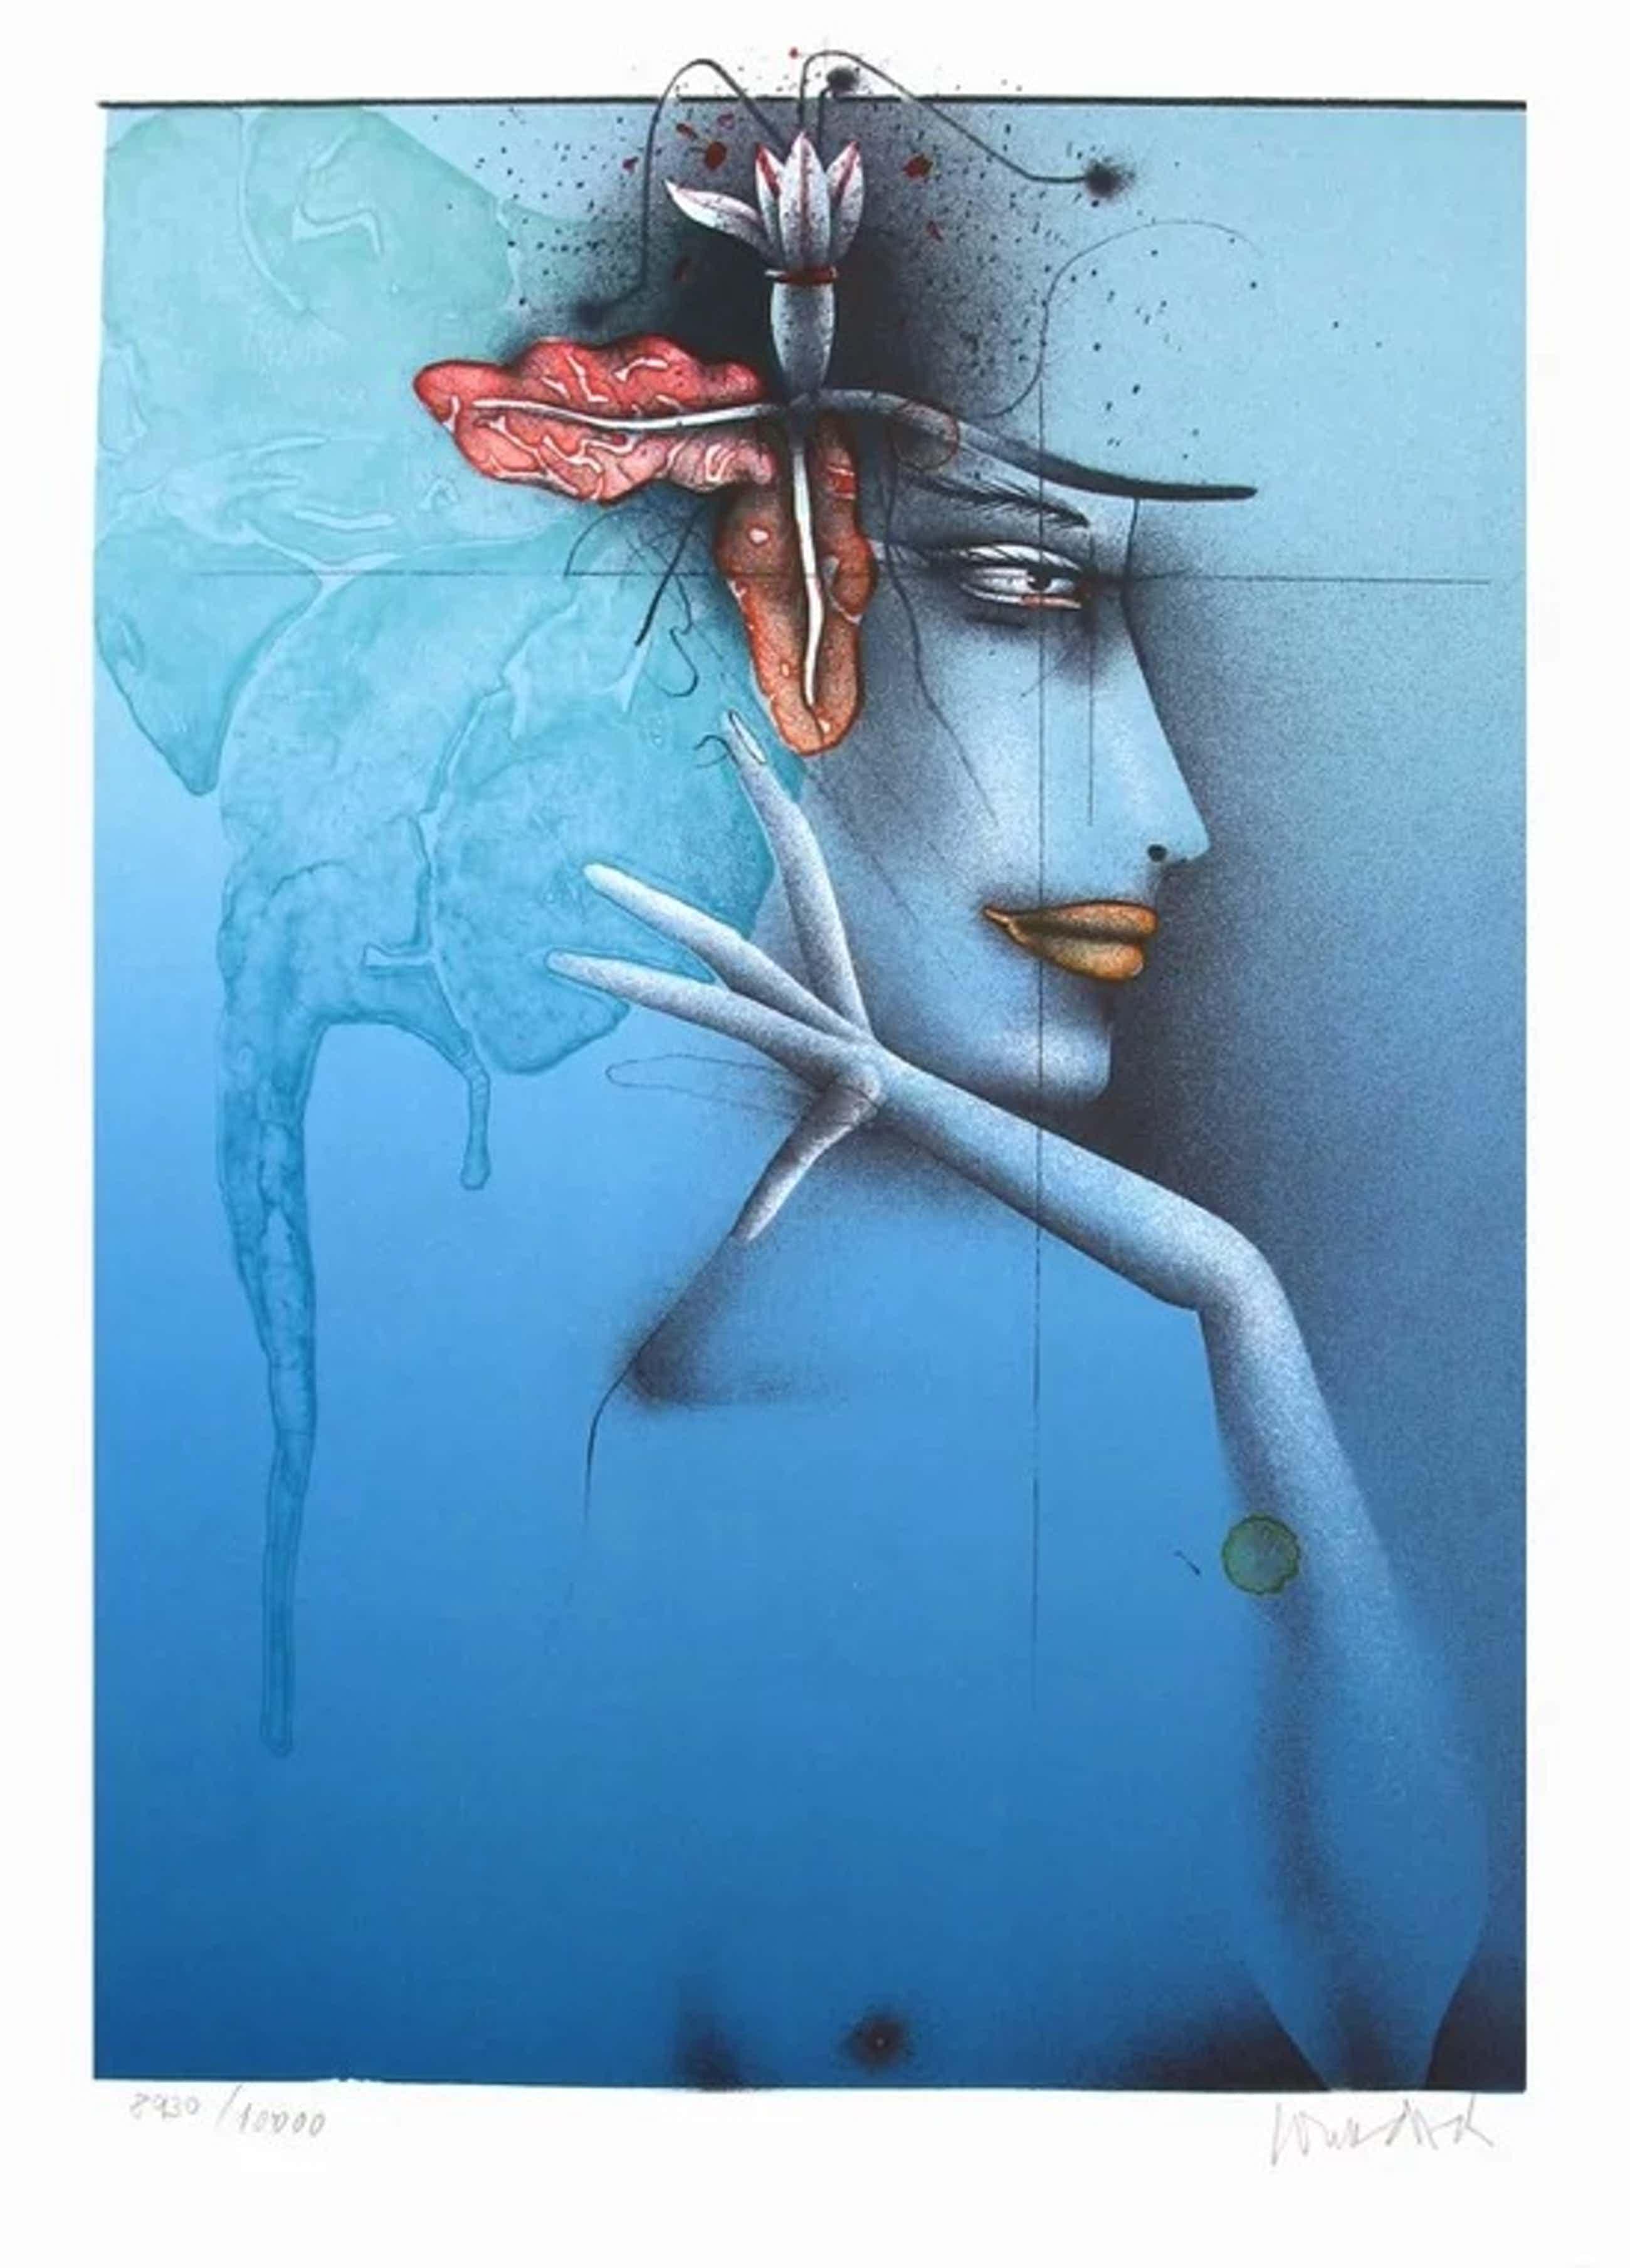 Paul Wunderlich - Tete d' une femme, bleu - Lithografie - Handgesigneerd kopen? Bied vanaf 52!